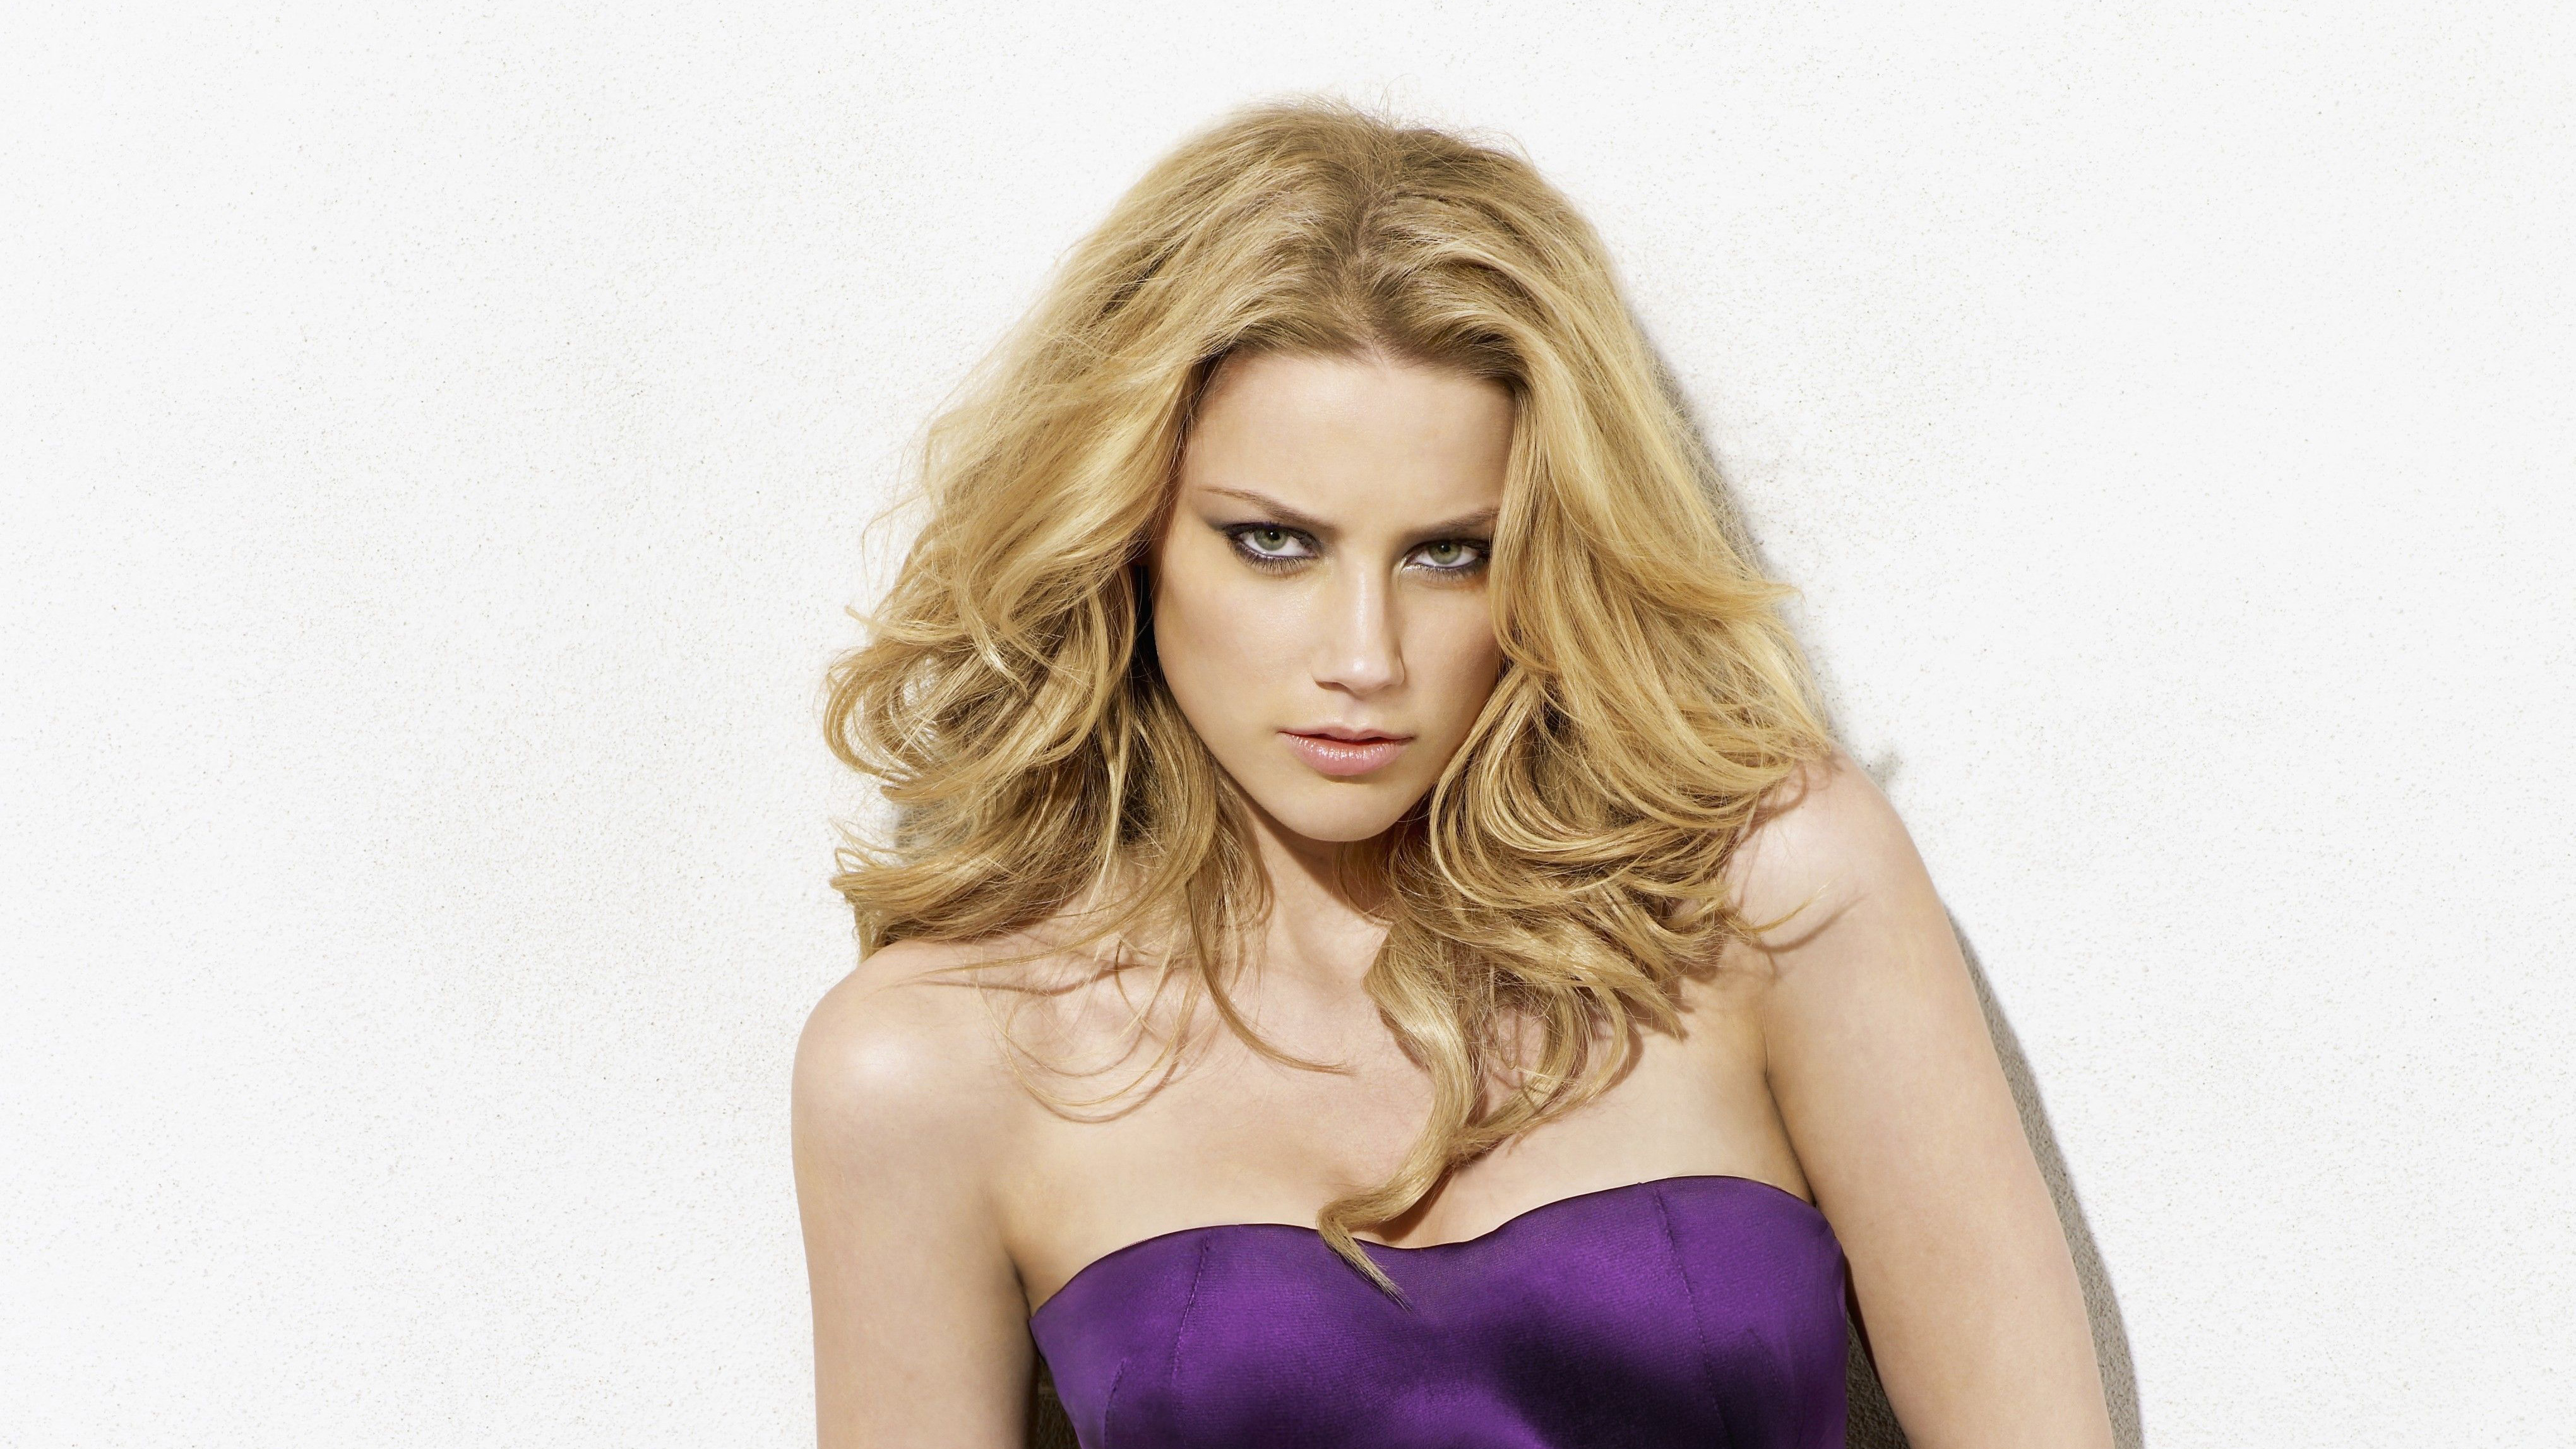 Amber Heard Hd: 3840x2400 4k Amber Heard Actress 4k HD 4k Wallpapers